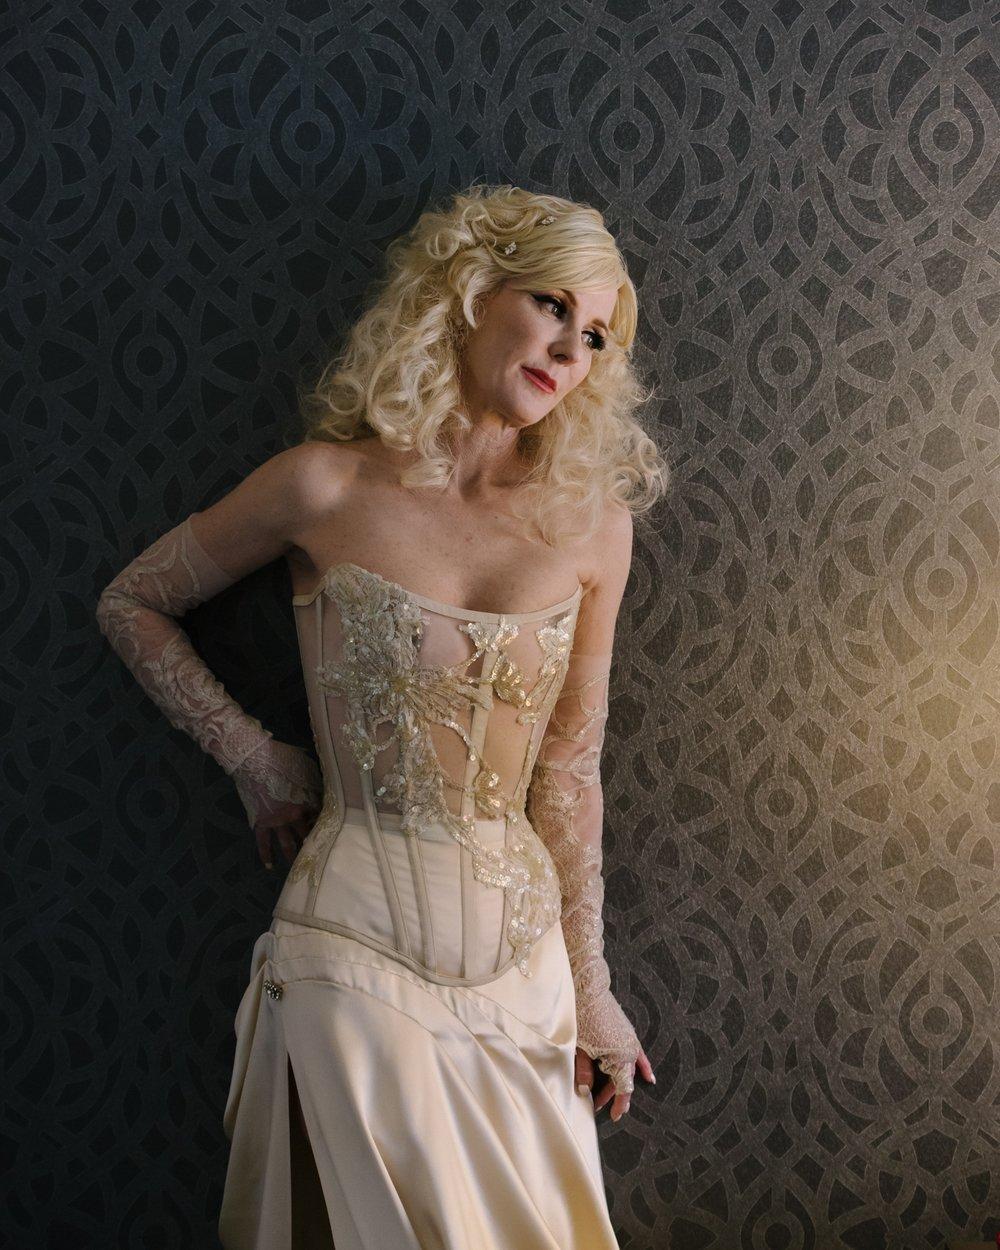 Bridal ensemble designed by Autumn Adamme Photo © Loic Nicolas